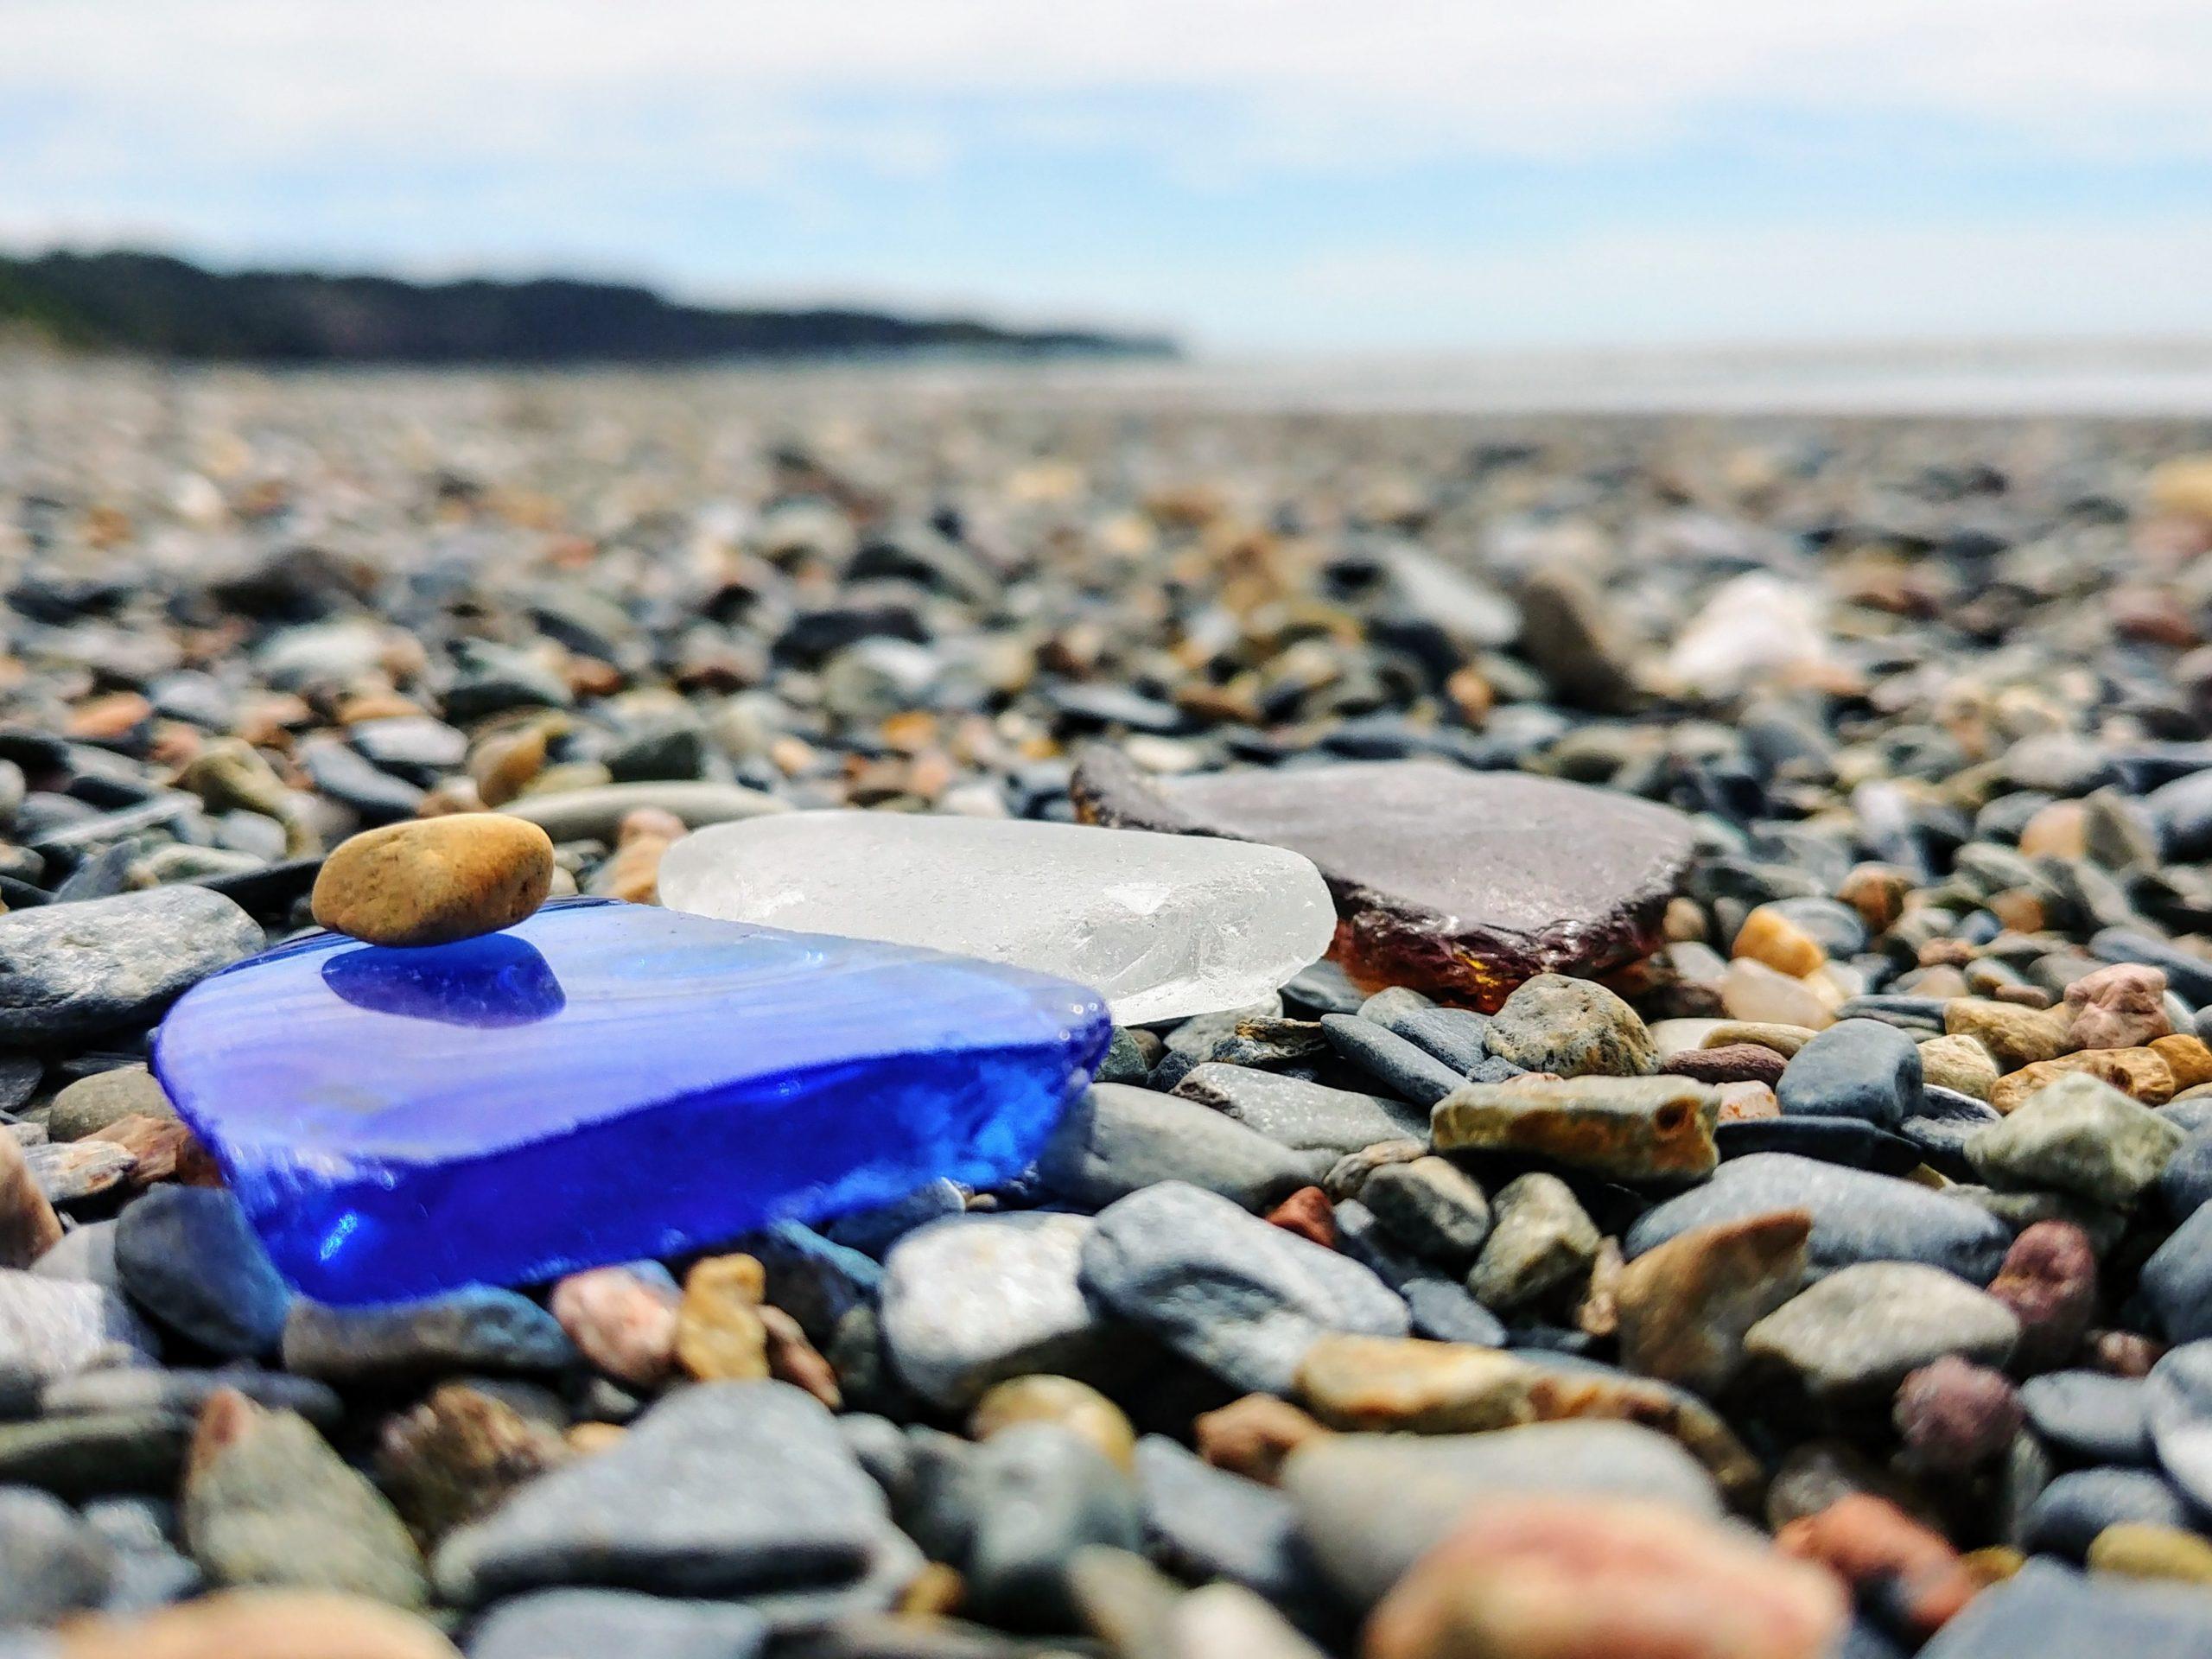 Beachcombing 2 - Mavillette